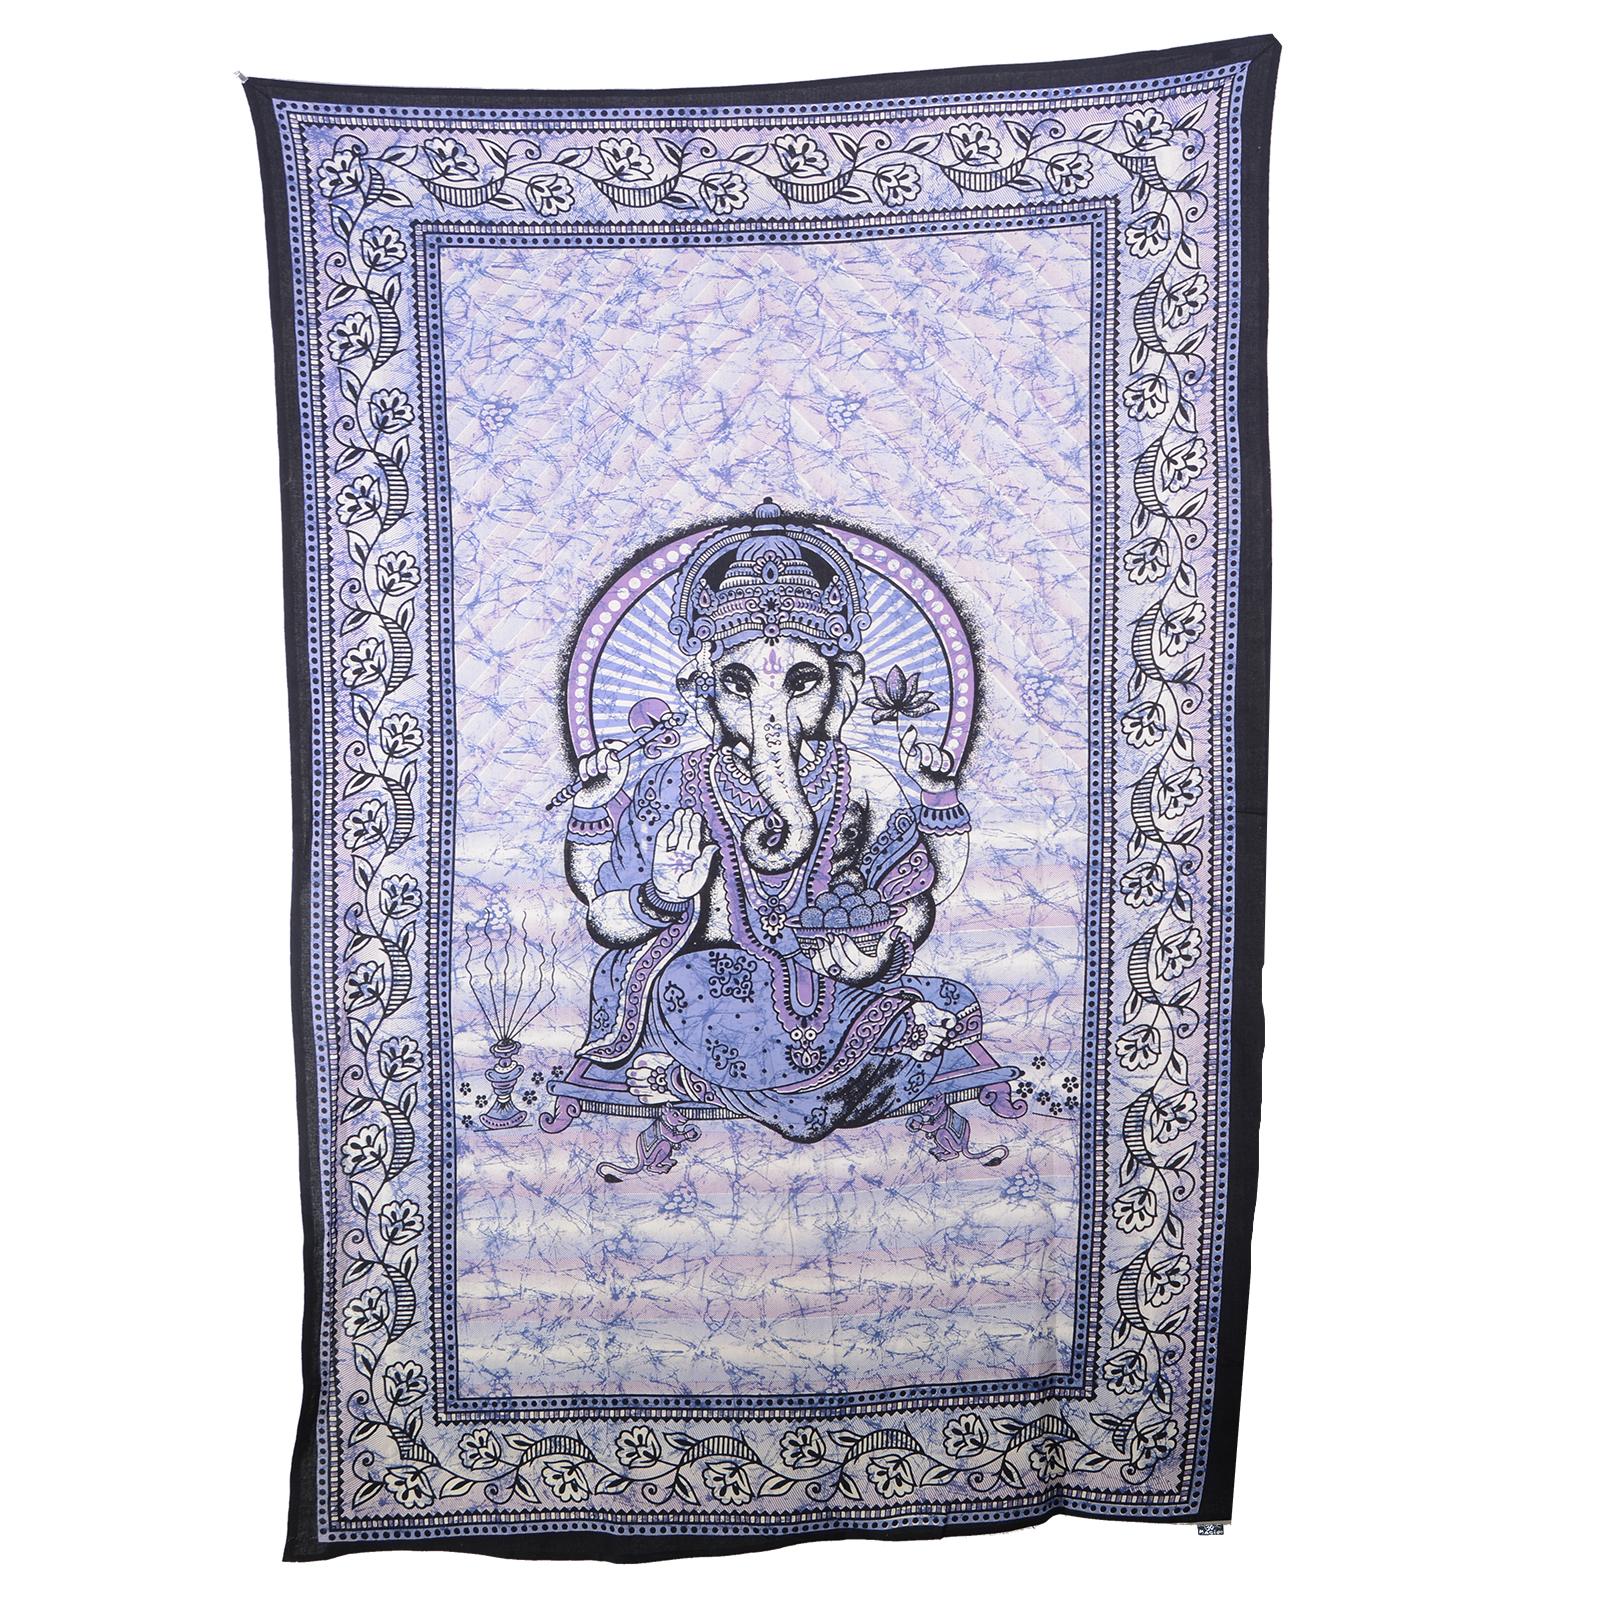 Kunst-und-Magie-Wandbehang-034-Ganesha-034-Dekotuch-Tagesdecke